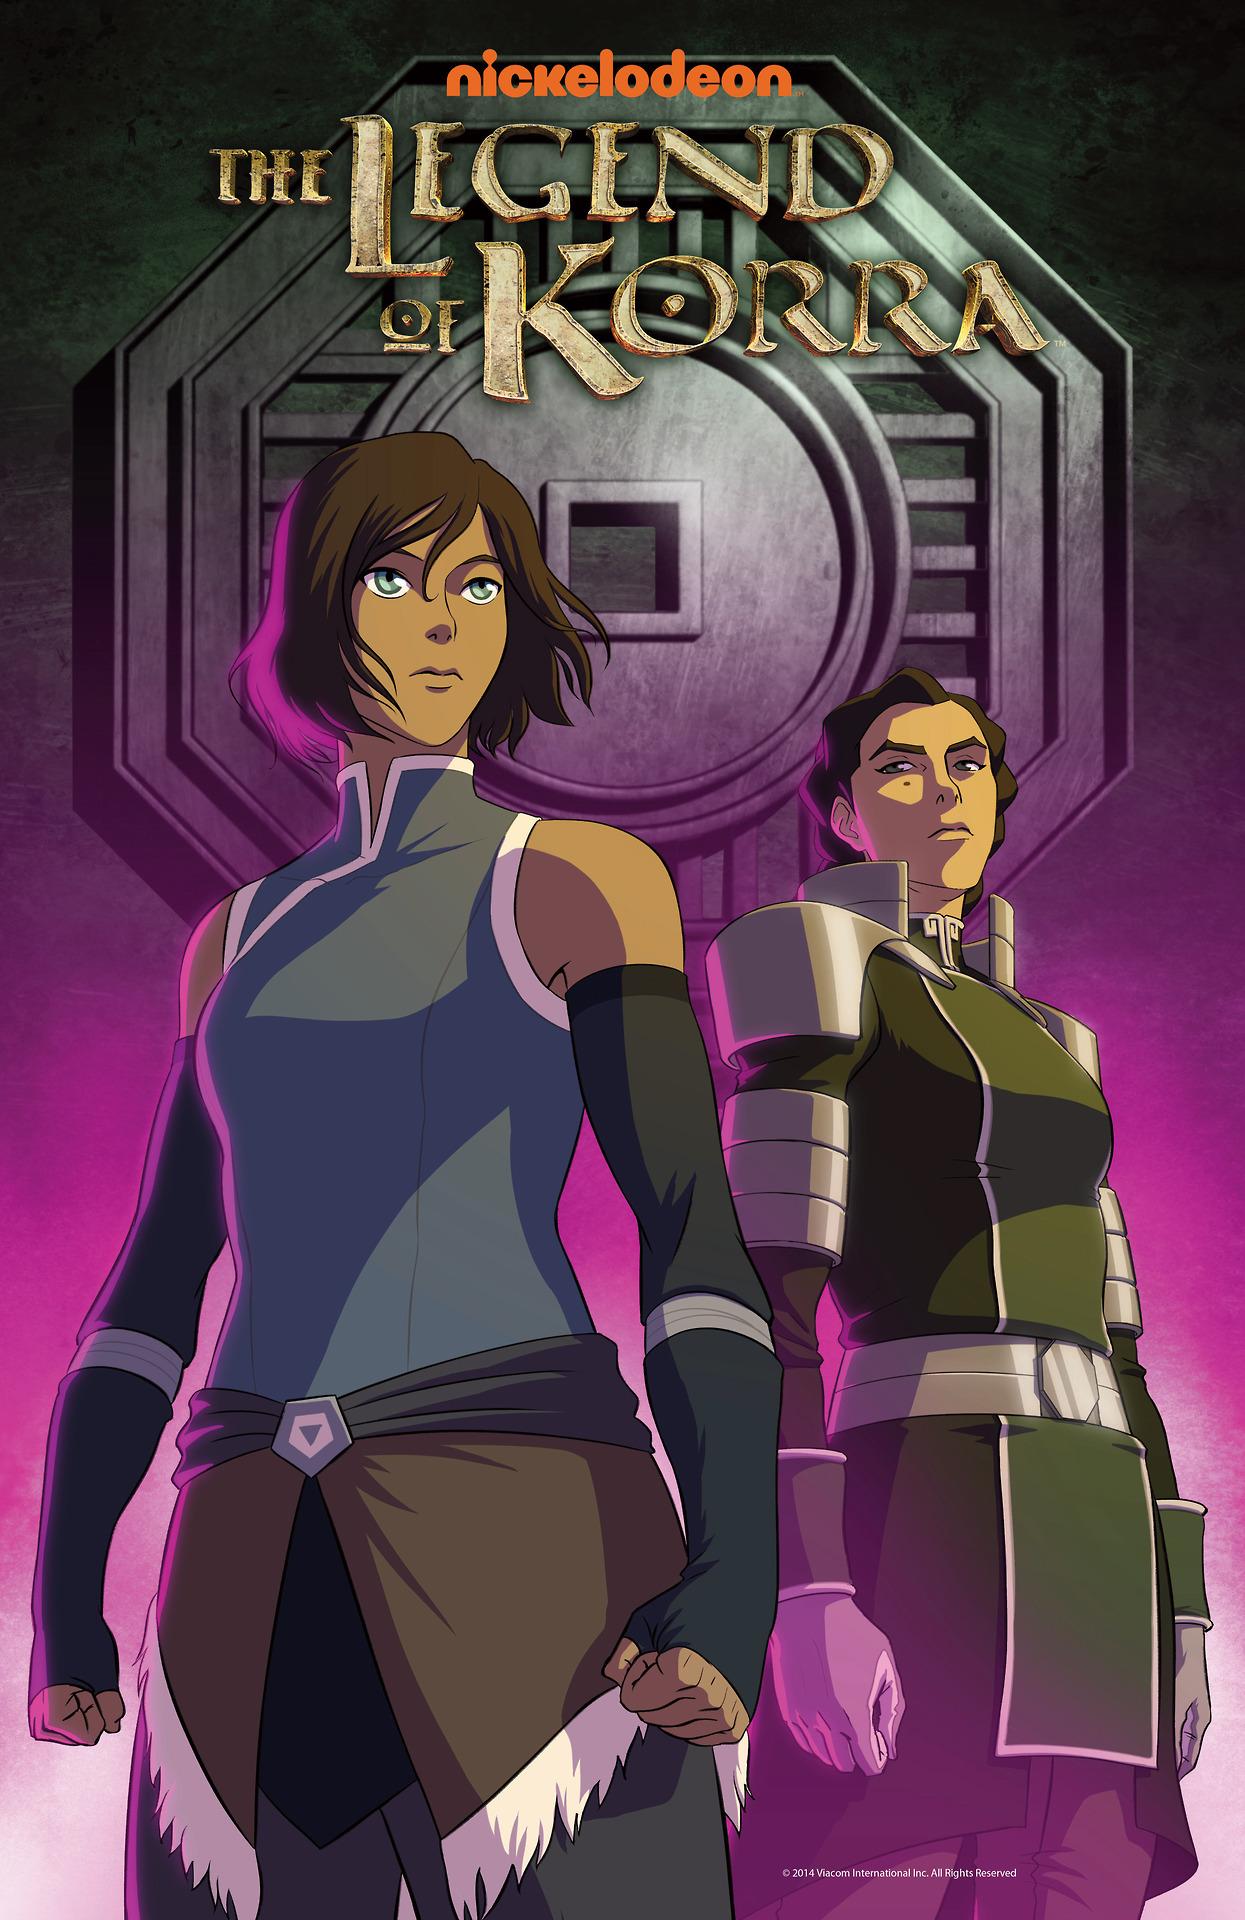 Avatar: A Lenda de Korra Livro 4 – Dublado – Todos os Episódios